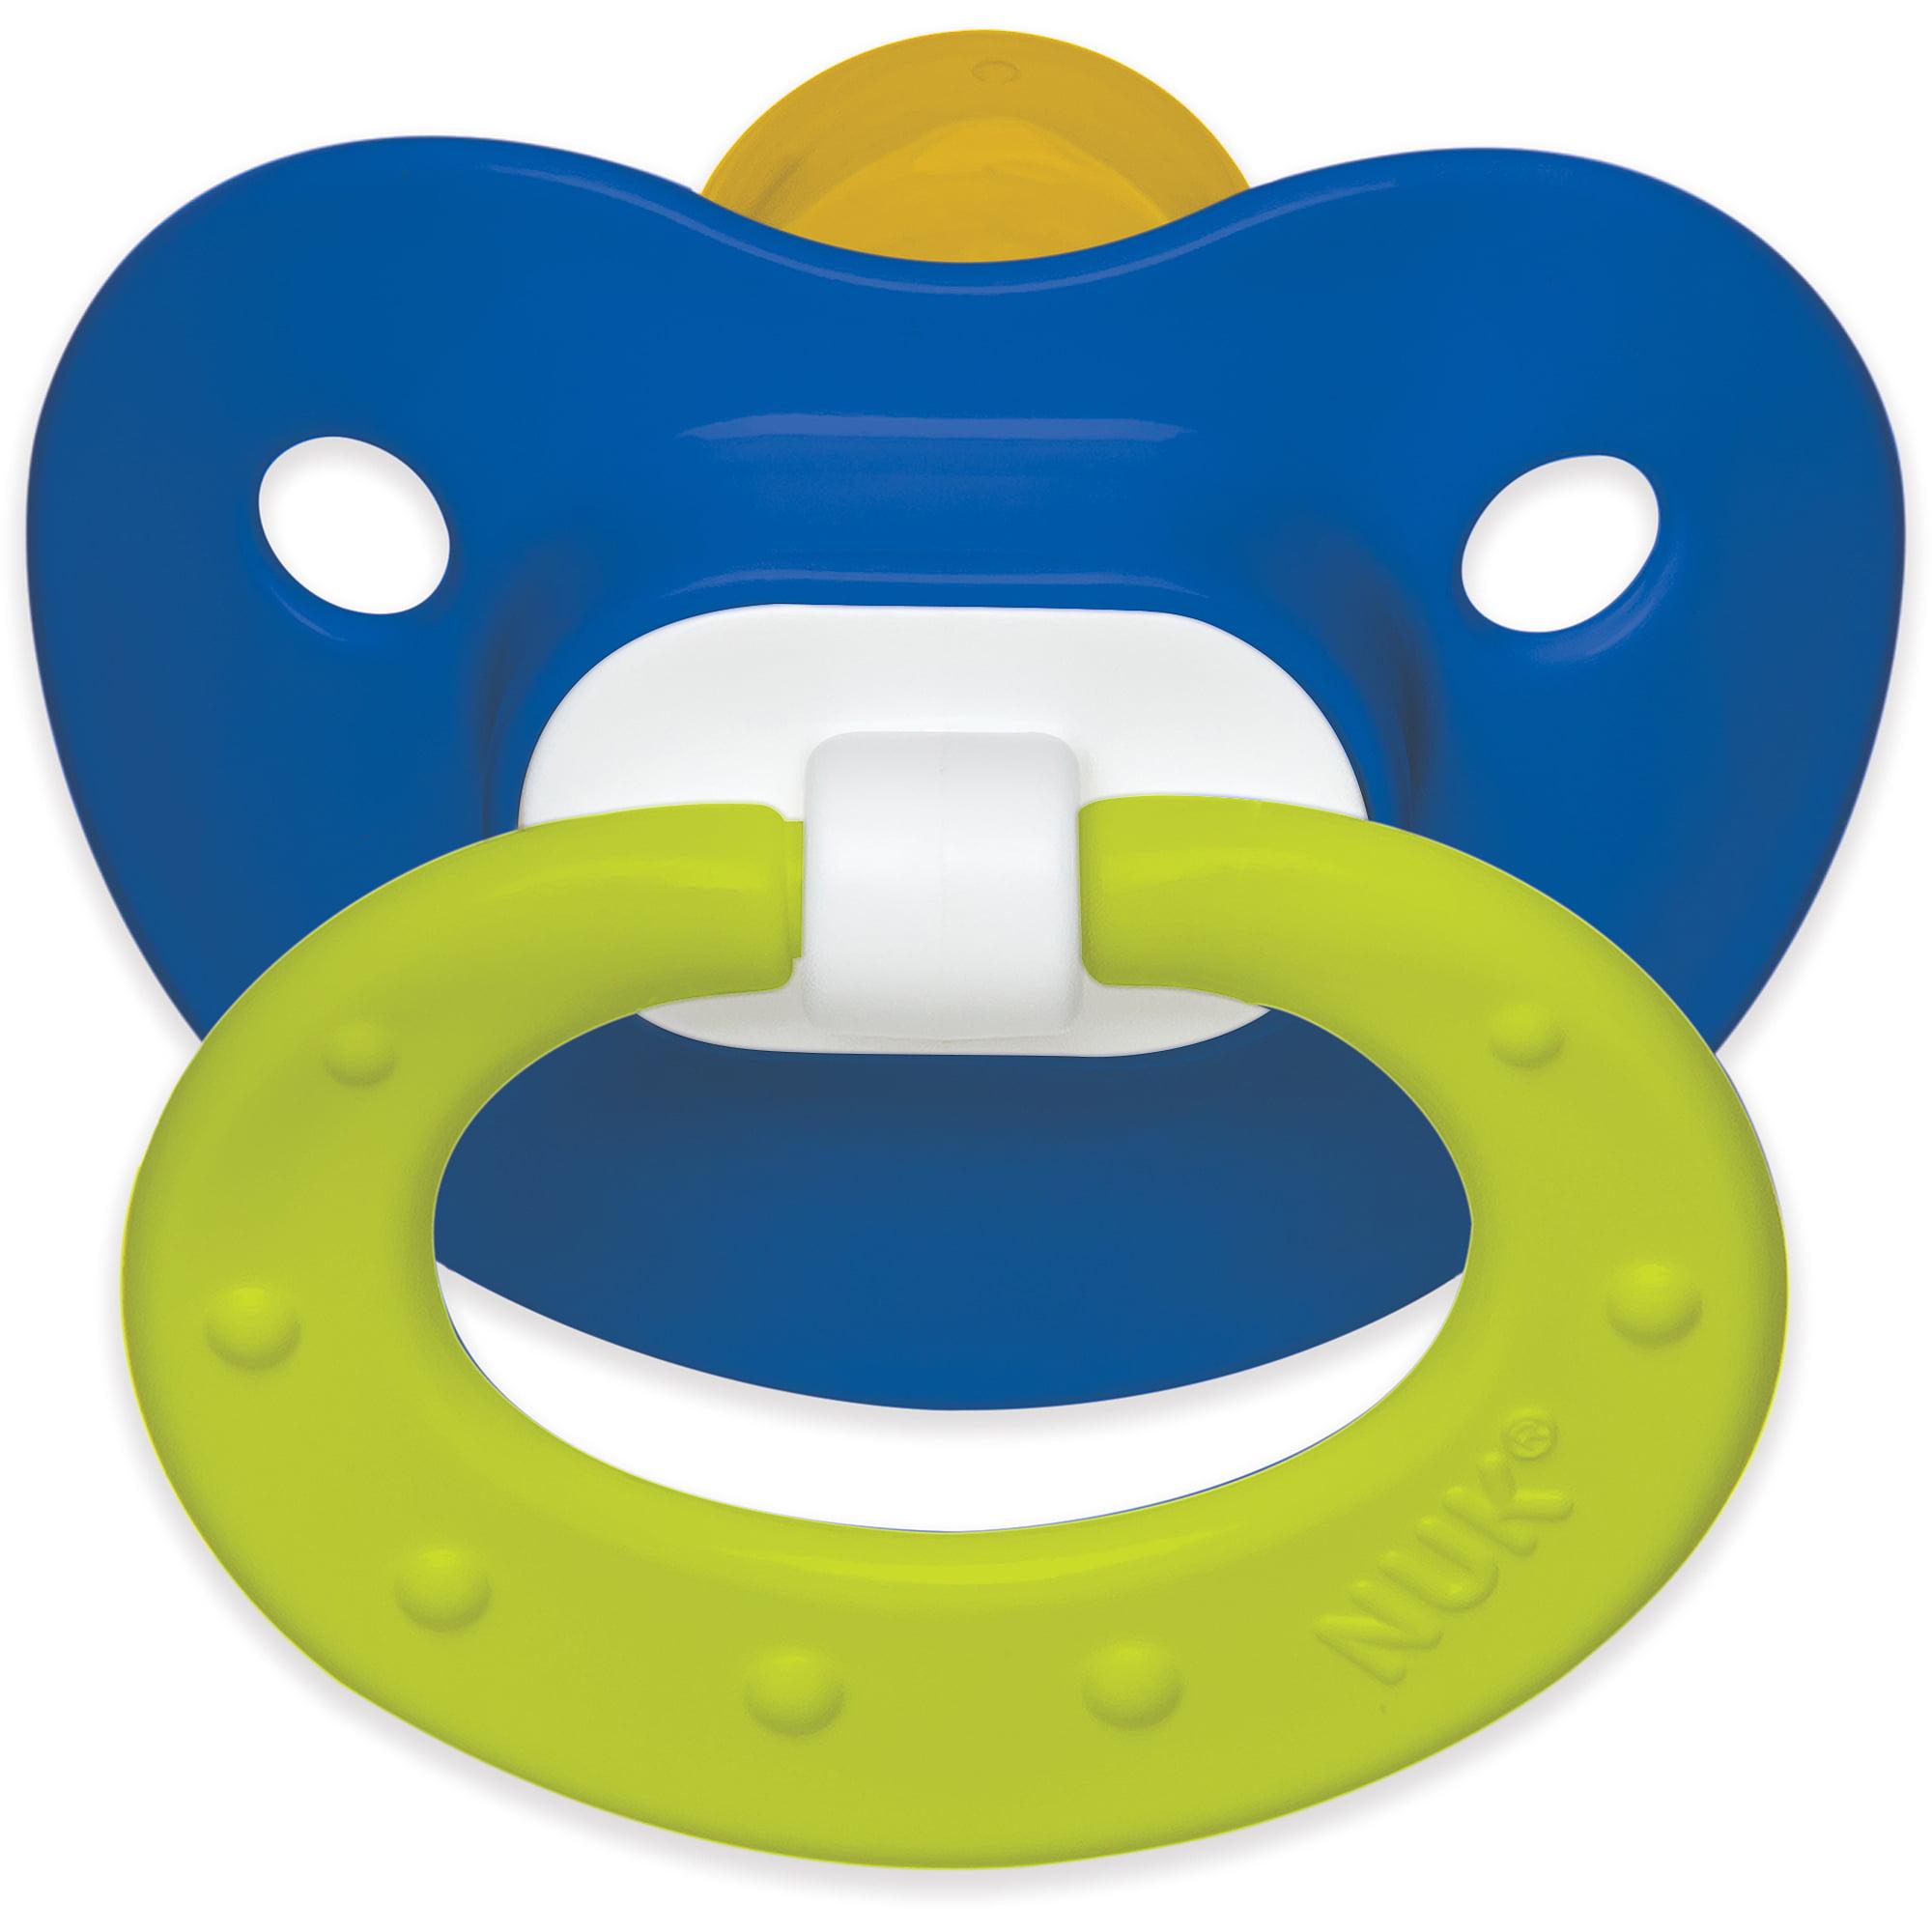 NUK Juicy Latex Orthodontic Pacifiers, 2ct, 6-18 months, BPA-Free (Colors May Vary)